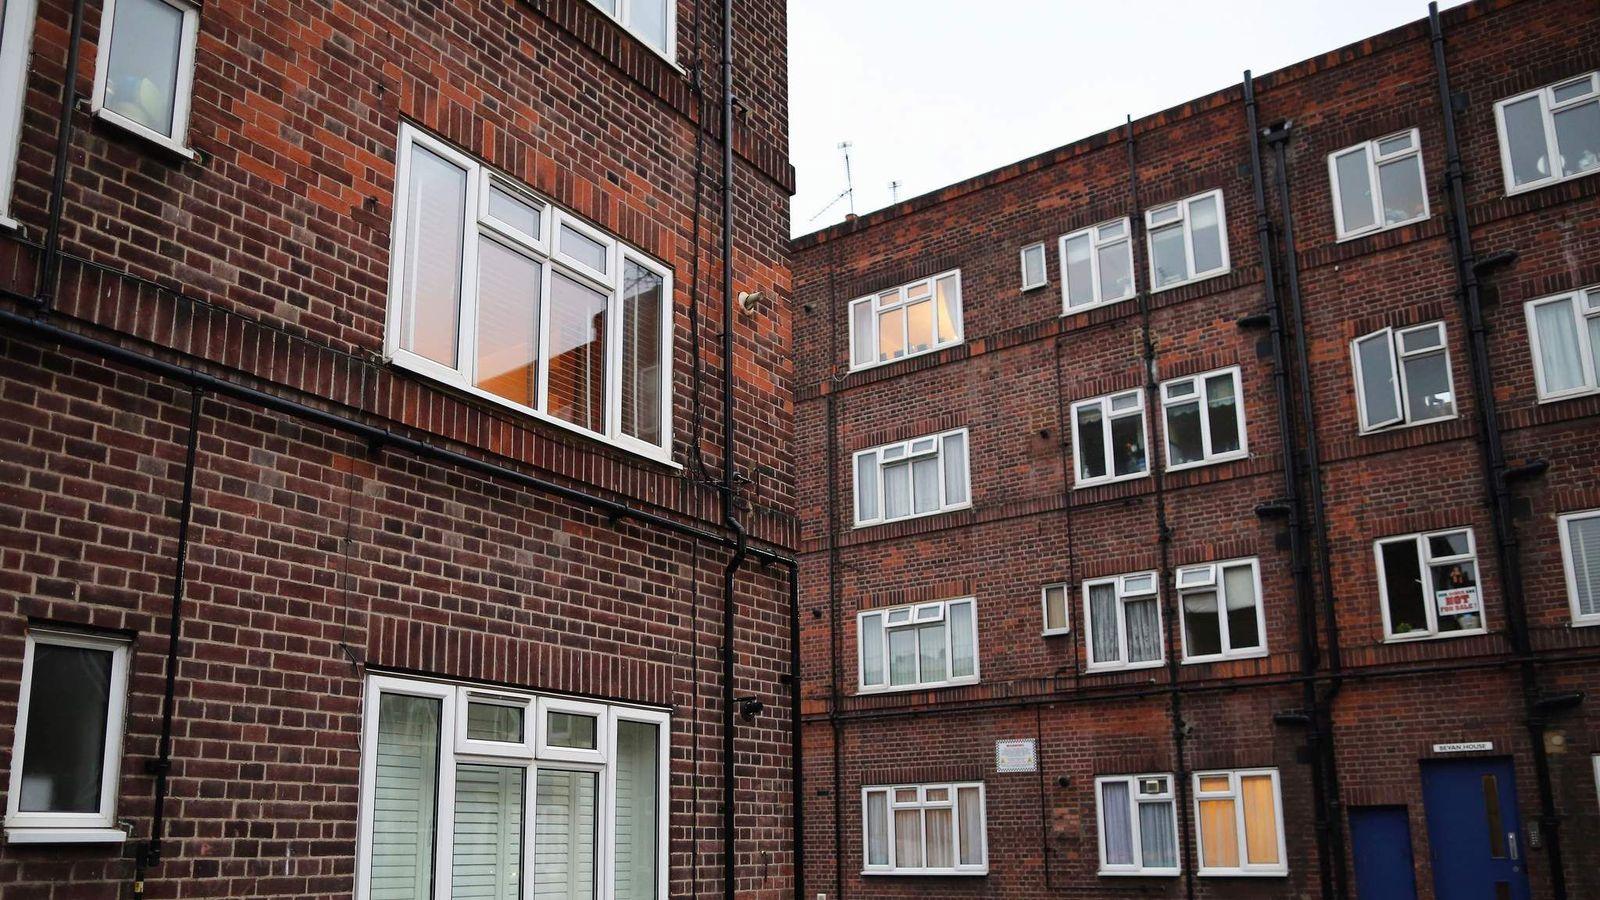 Housing estate in East London